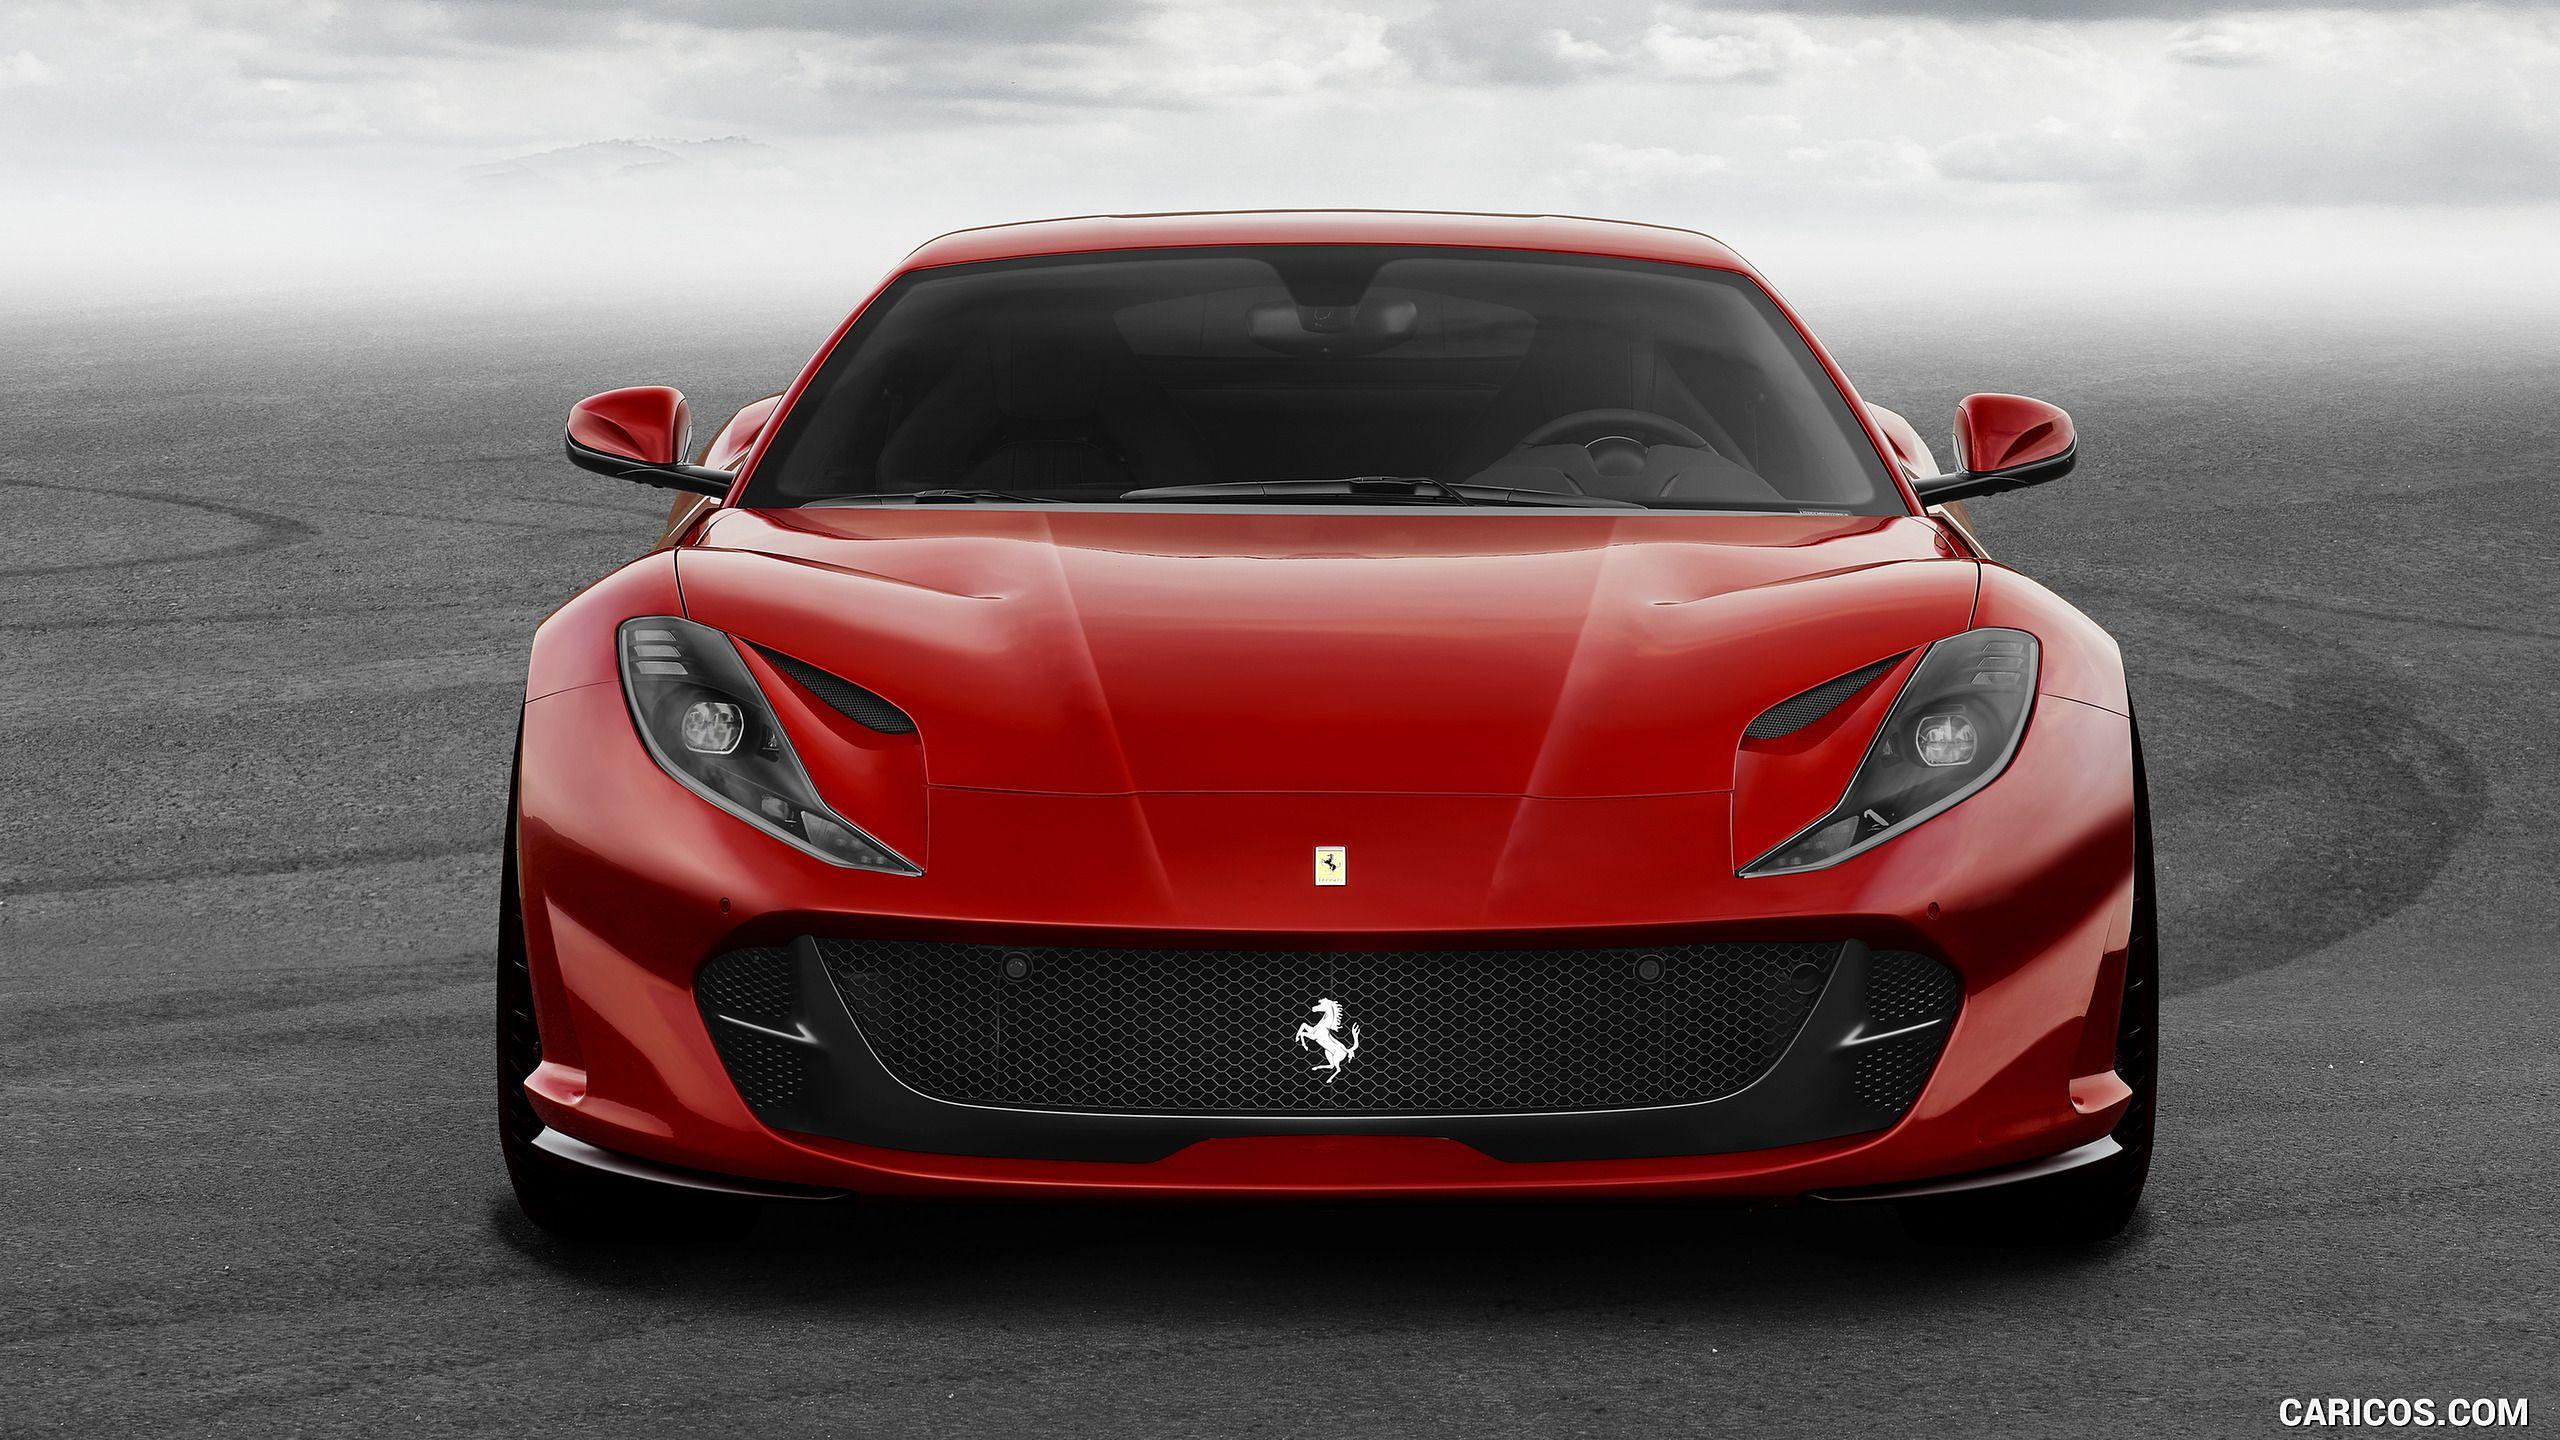 2018 Ferrari 812 Superfast Wallpaper Ferrari Car New Ferrari Sports Car